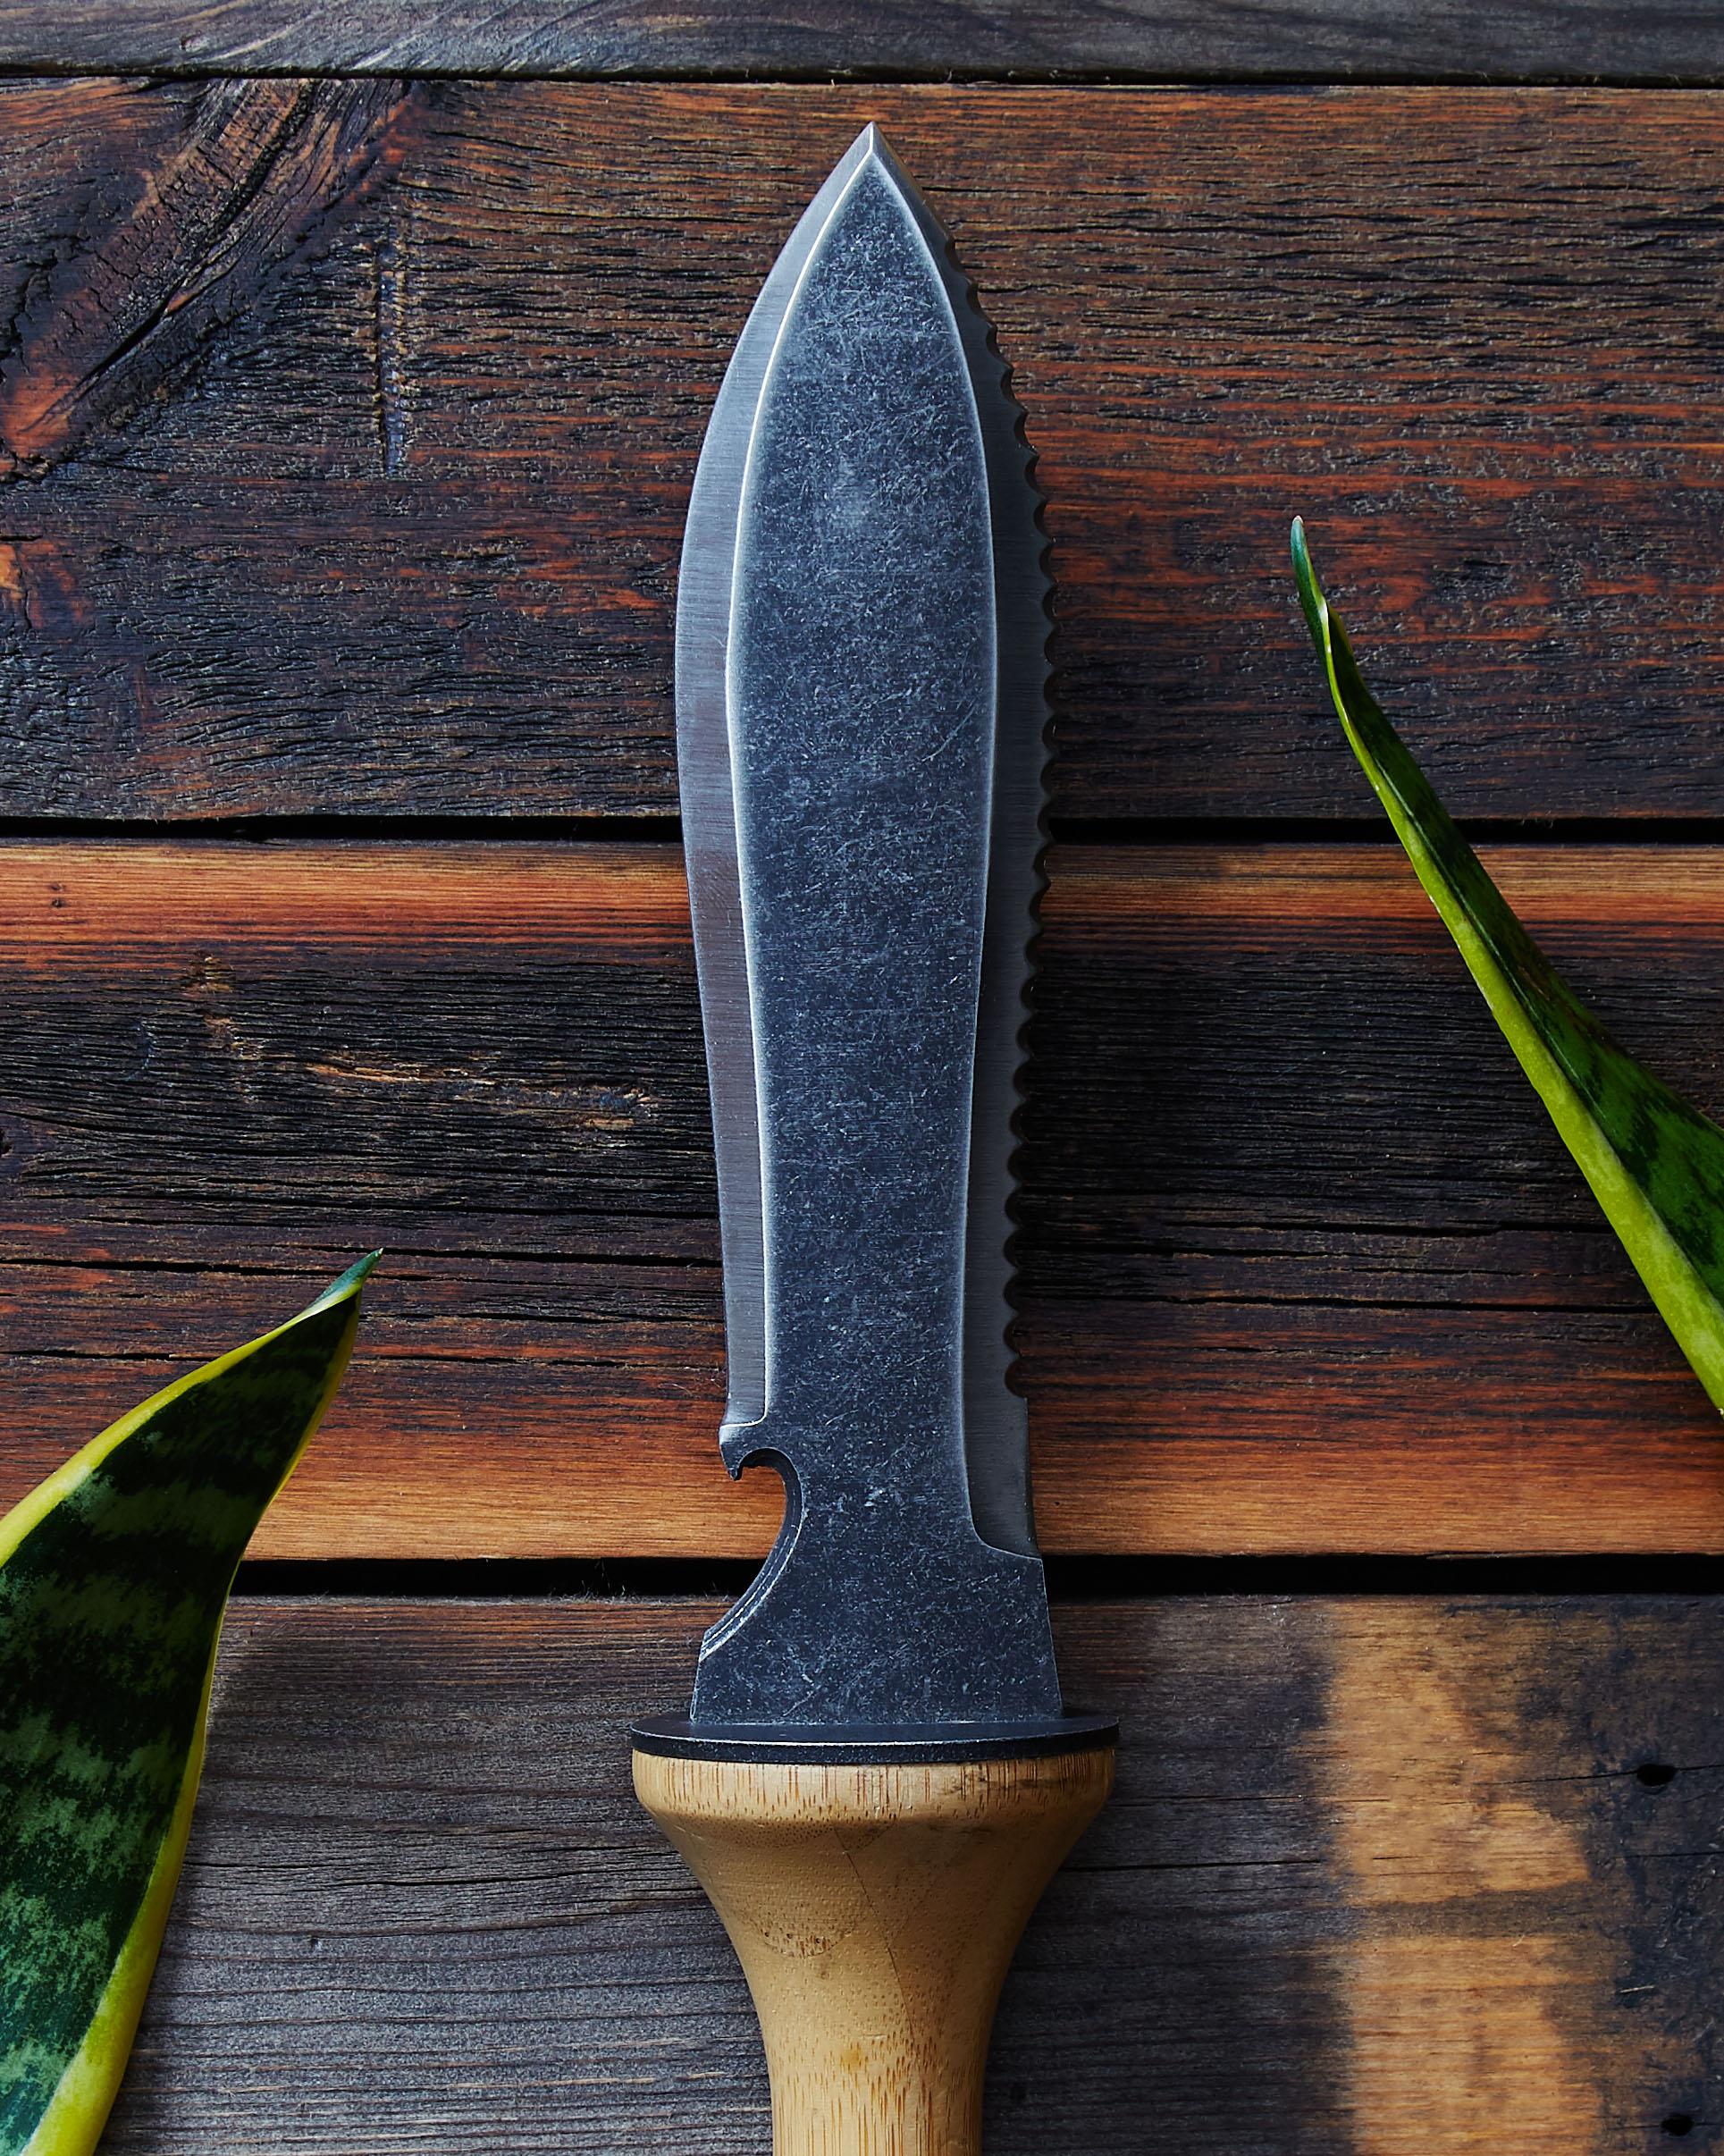 terra-knife-gardening-leaf-outdoors.jpg